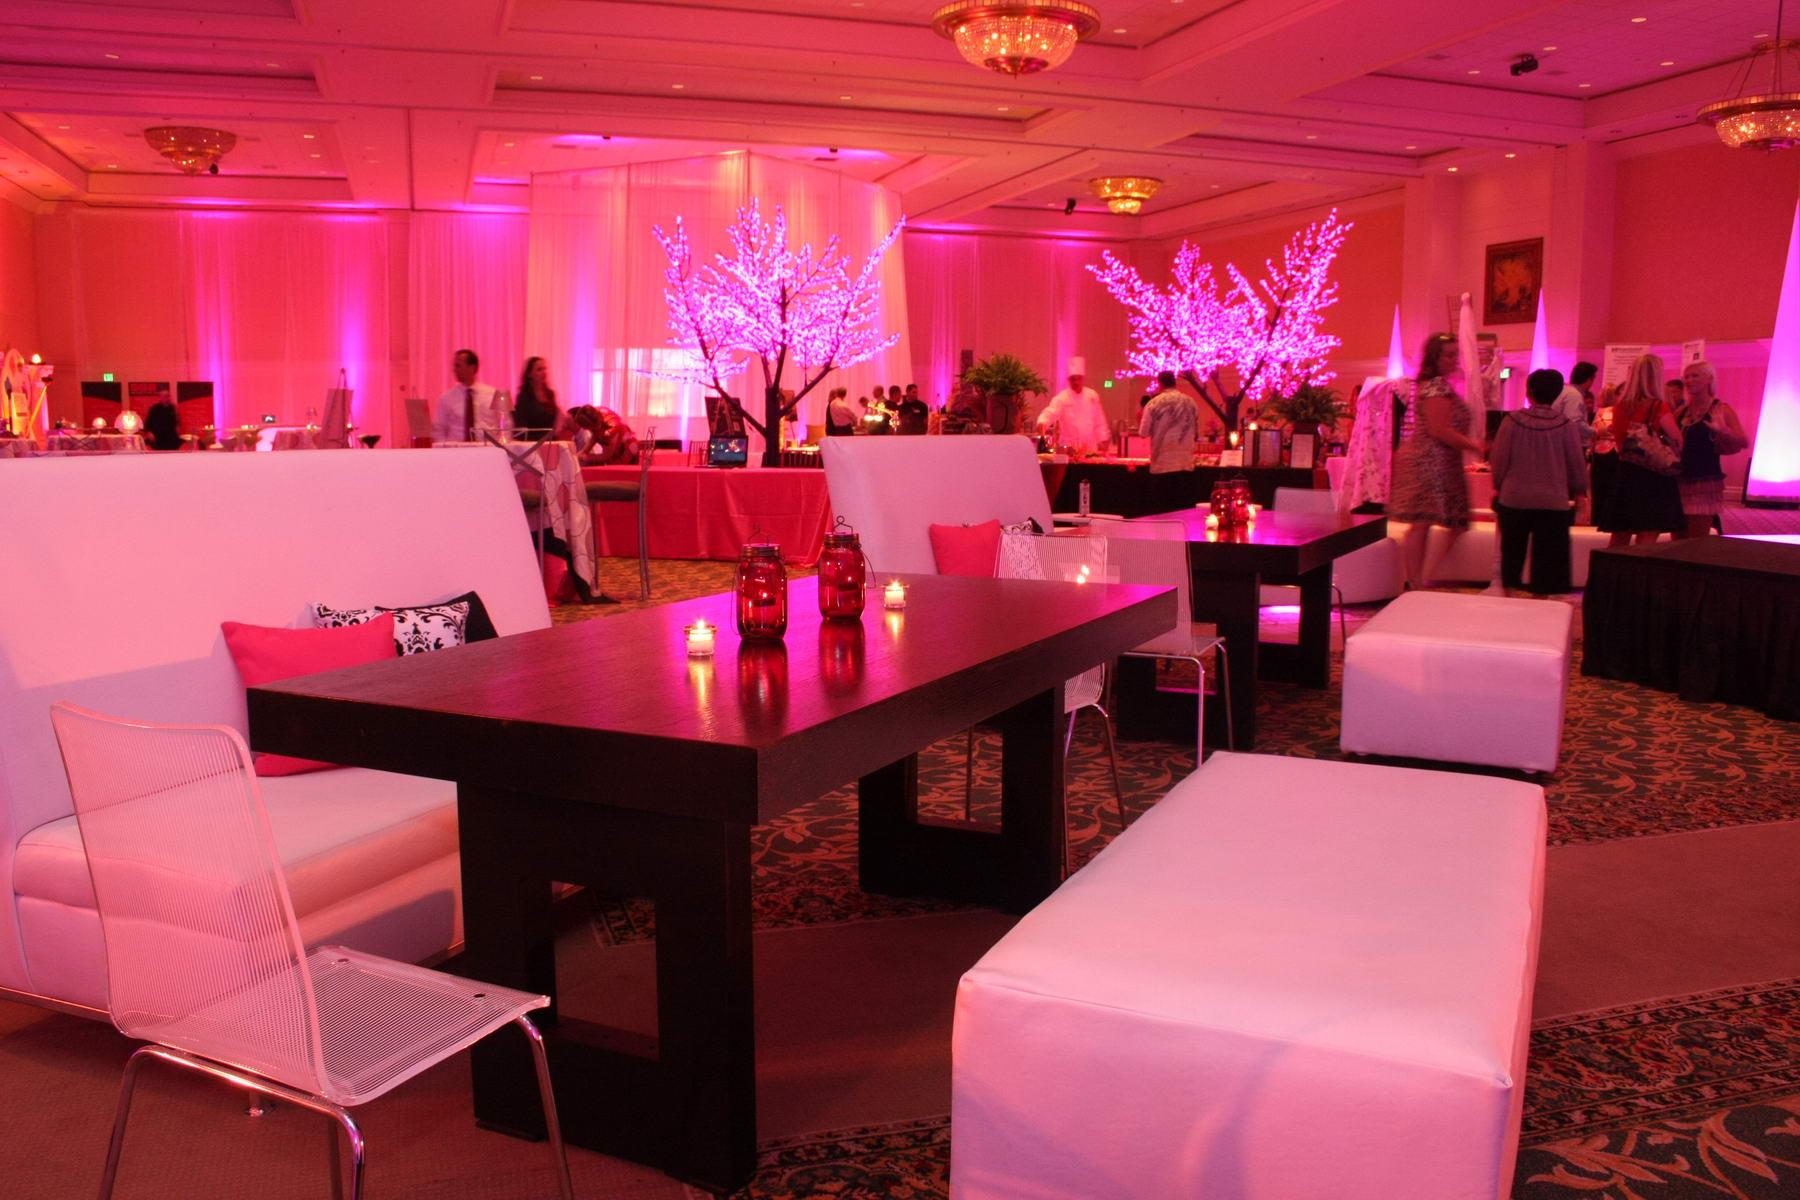 Room Service Rentals Blog Furniture And Event Rental